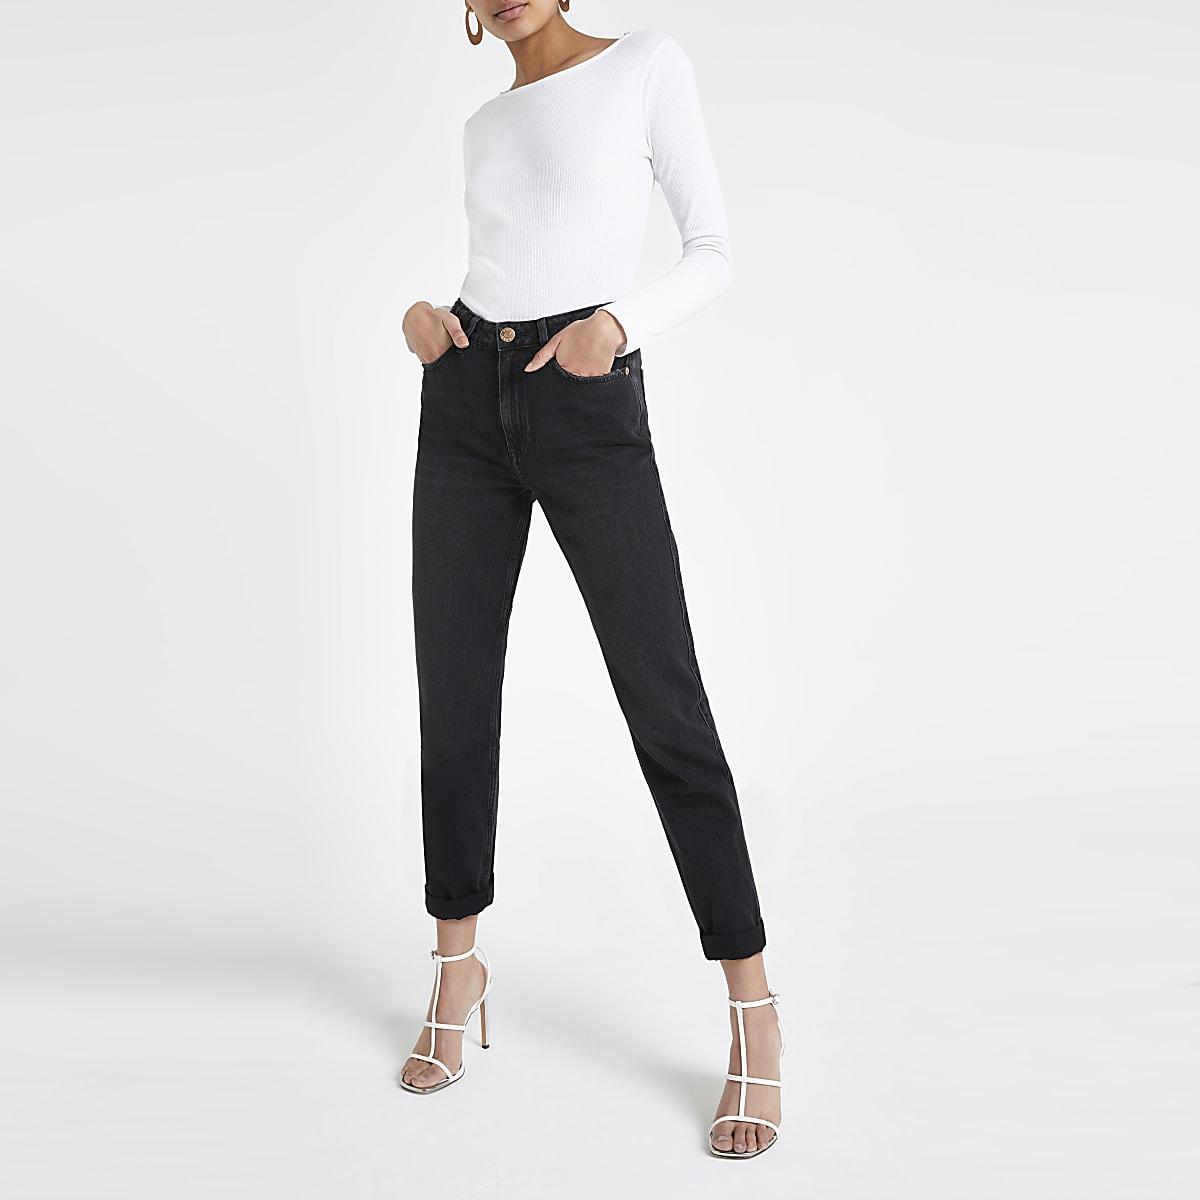 Black Mom high rise jeans